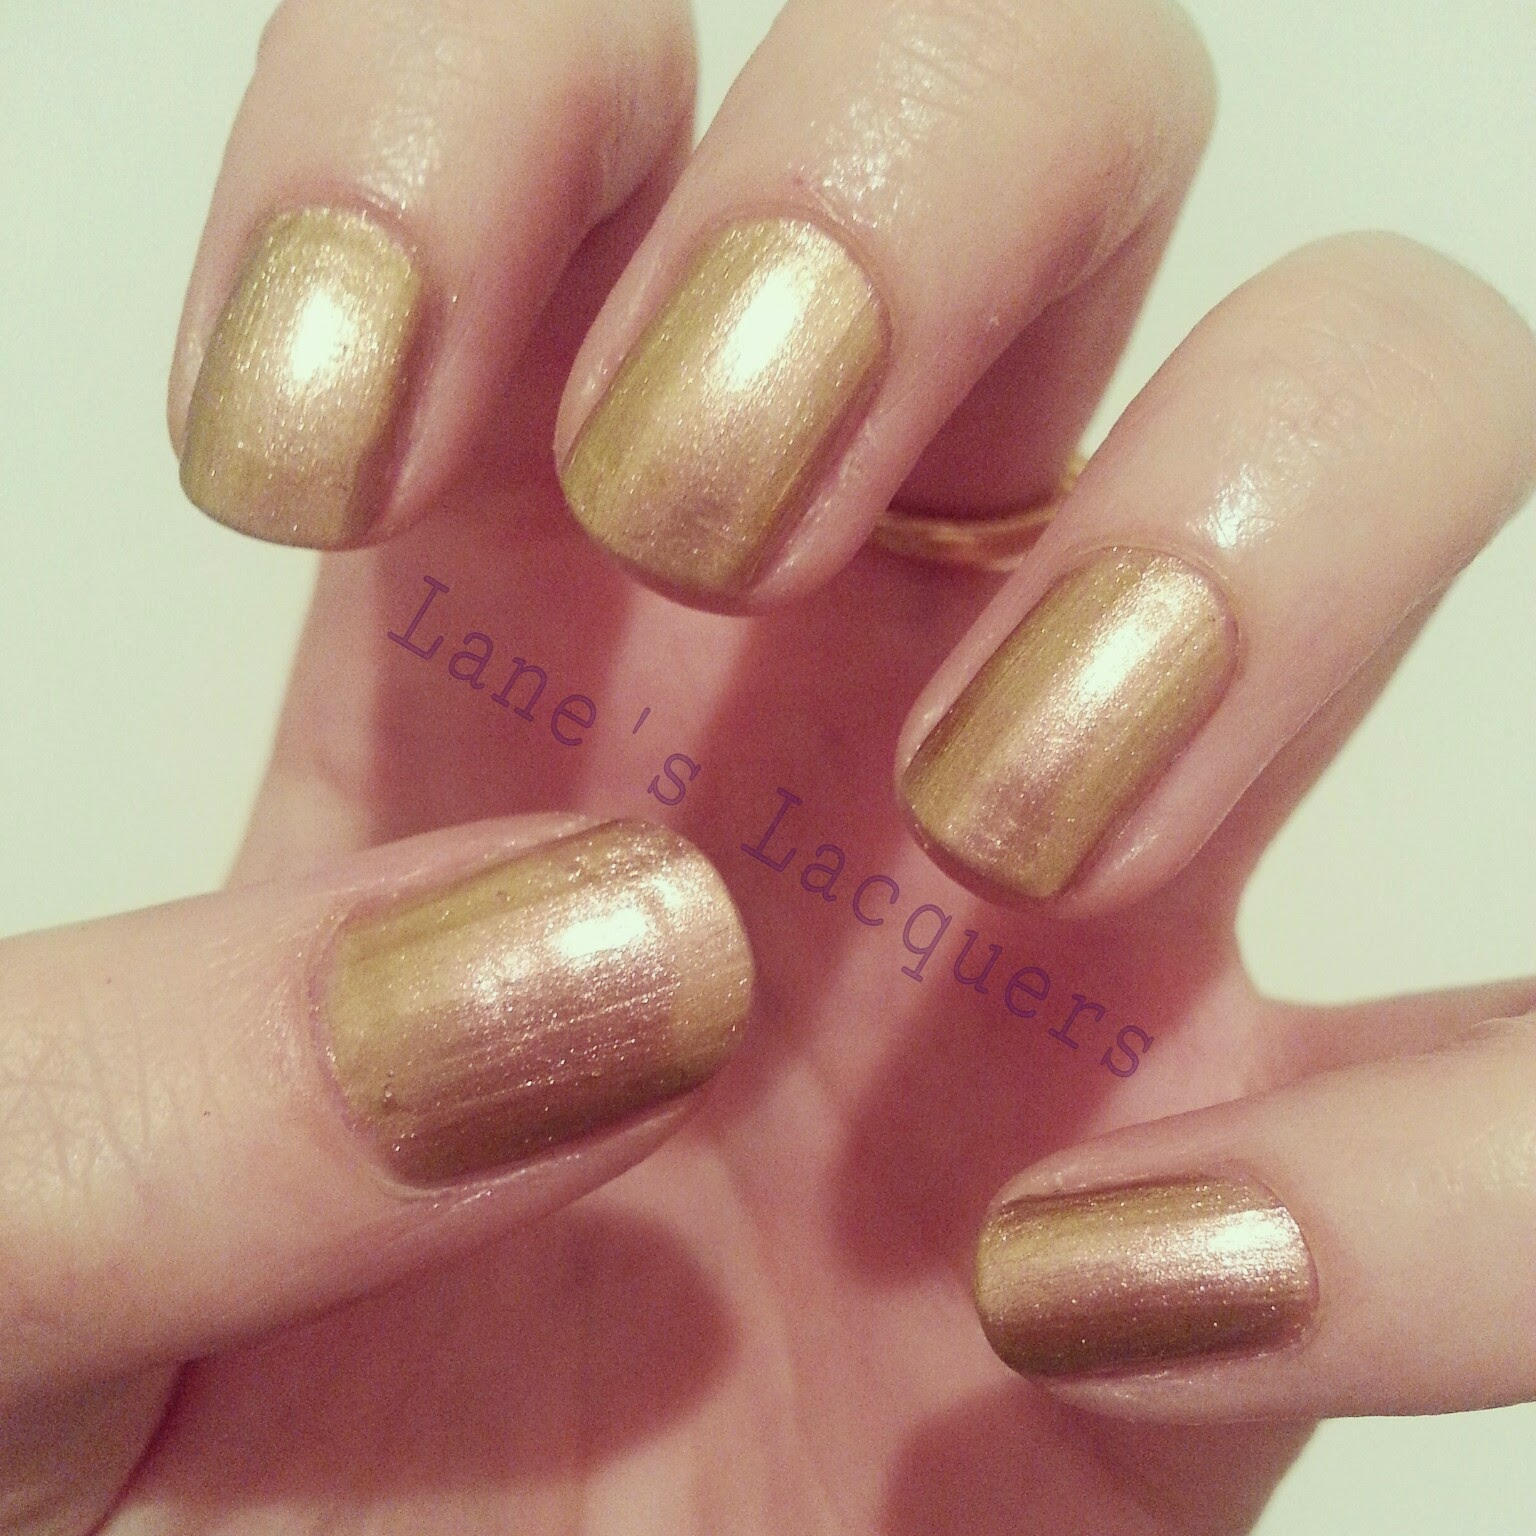 barry-m-aquarium-gold-aqnp3-swatch-manicure